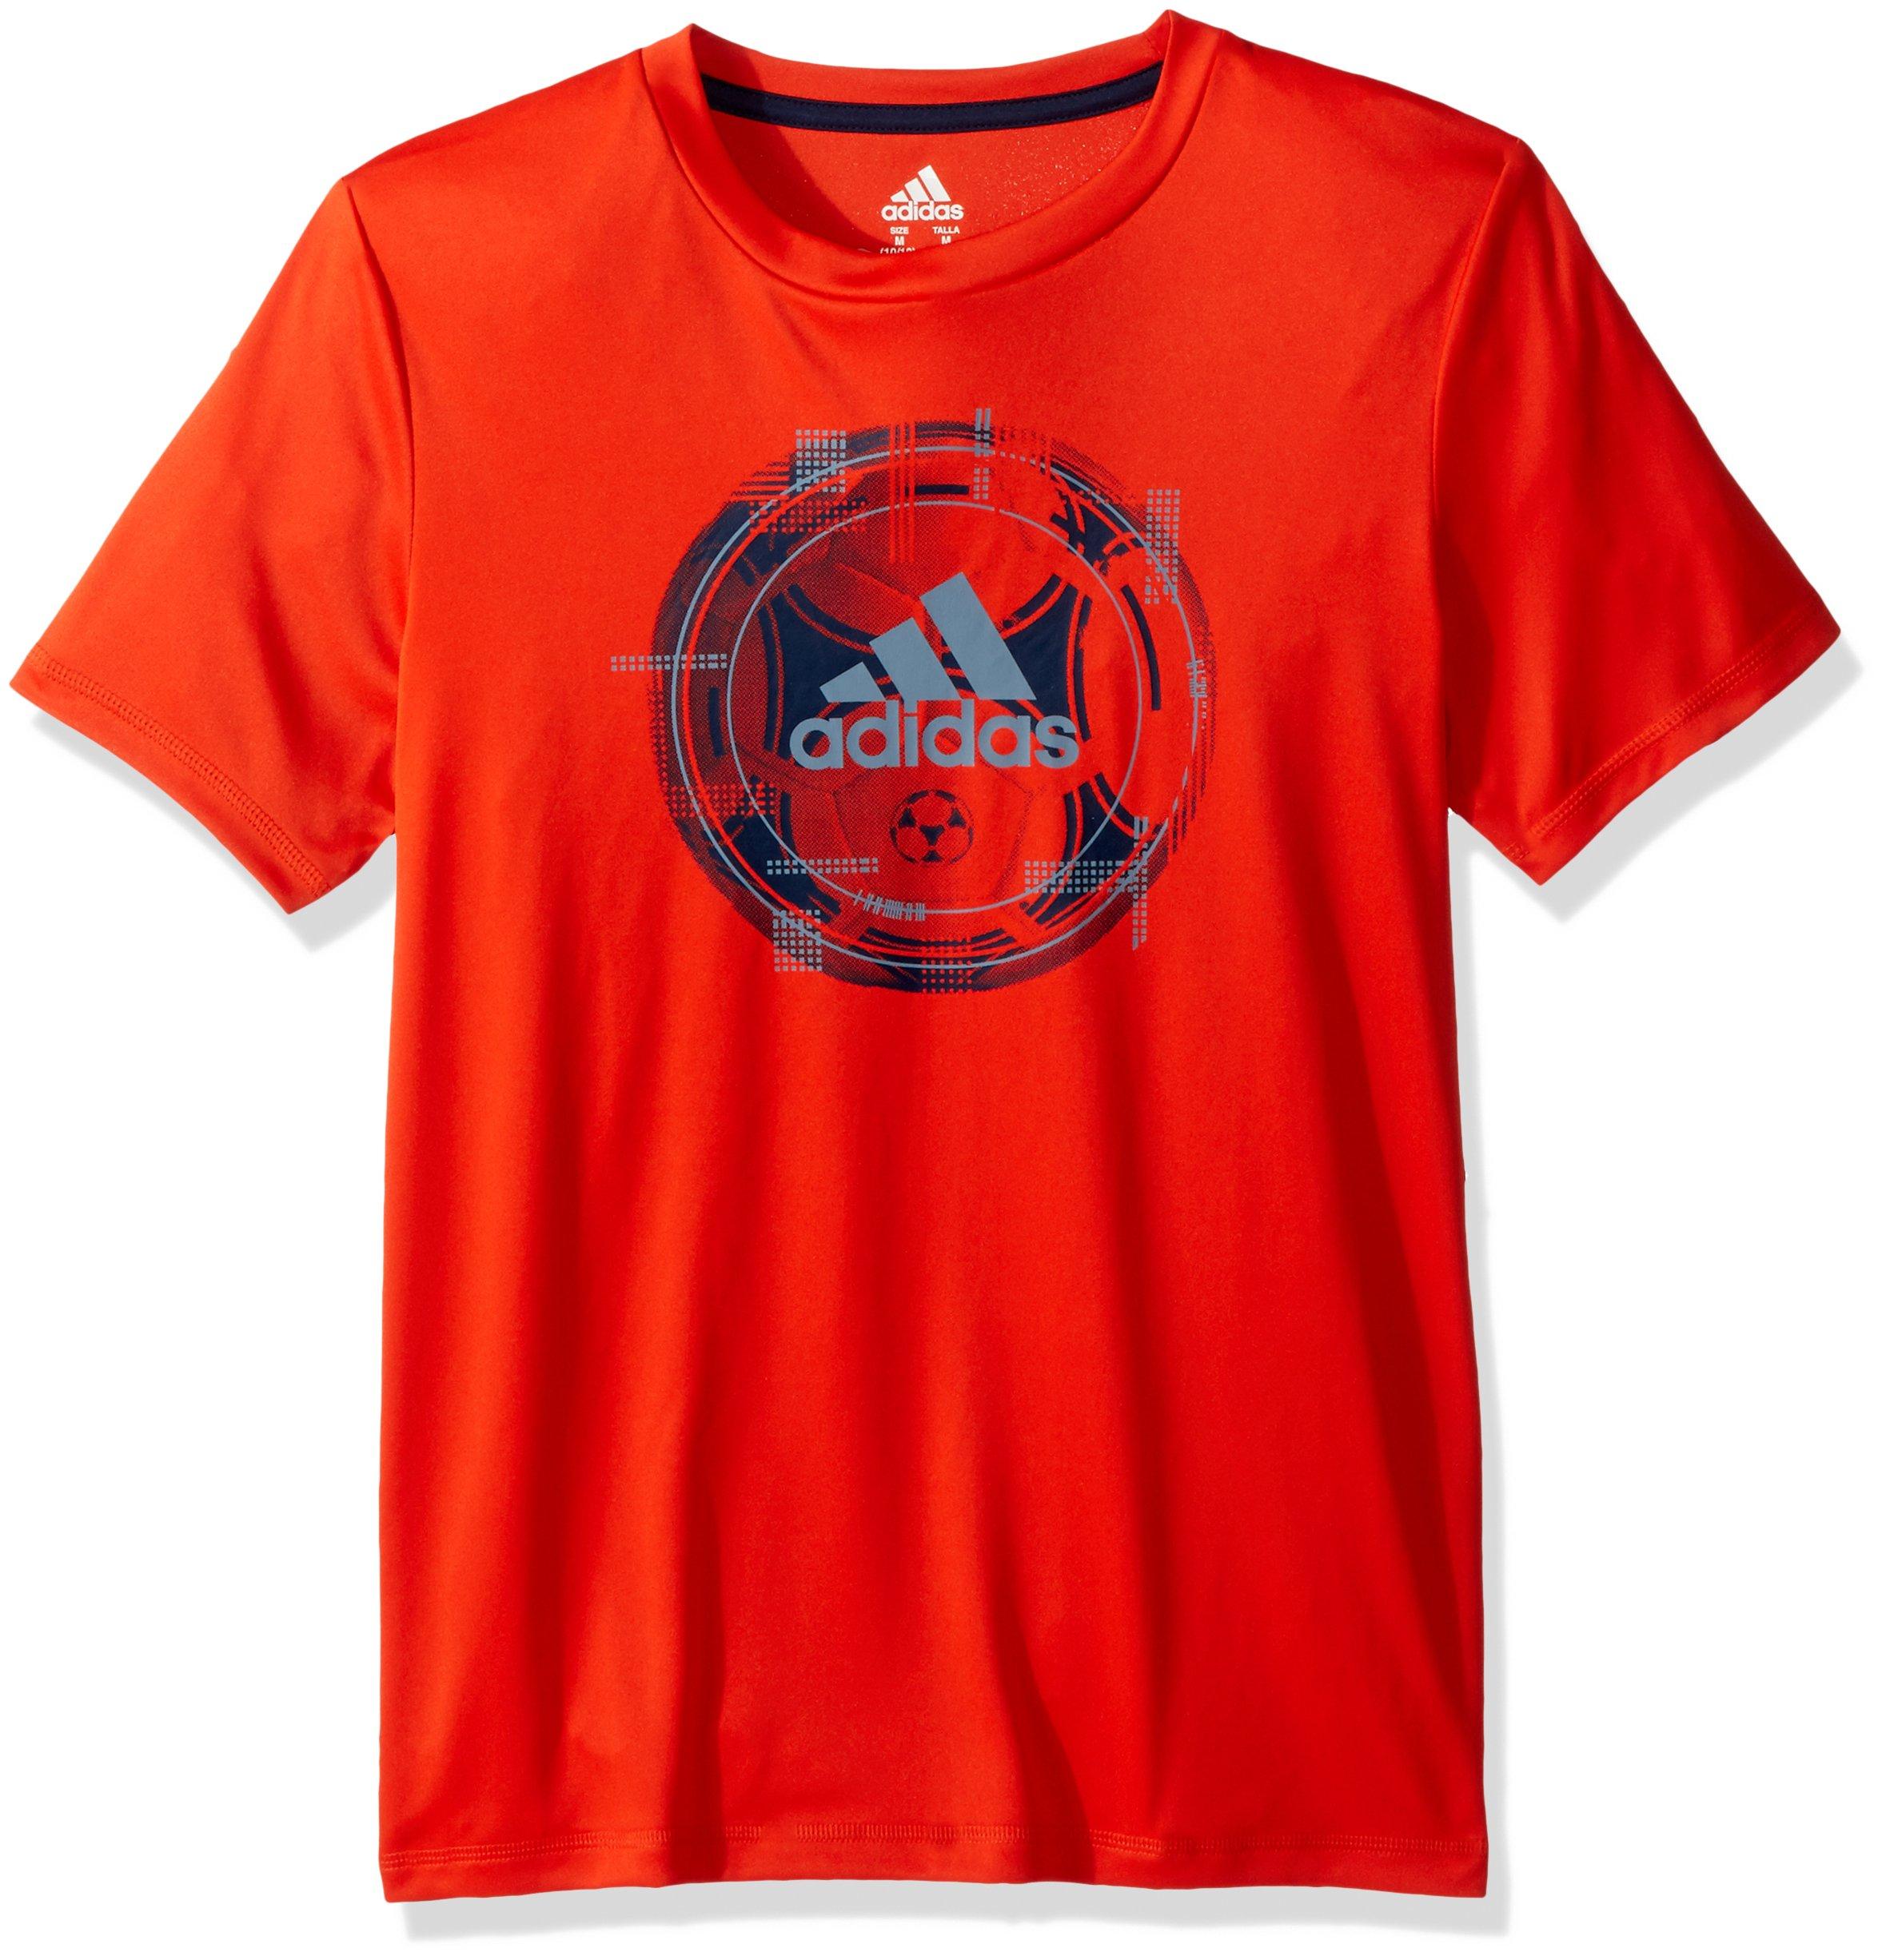 adidas Big Boys' Short Sleeve Graphic Tee Shirt, Bold Orange Adi 1, L(14/16)